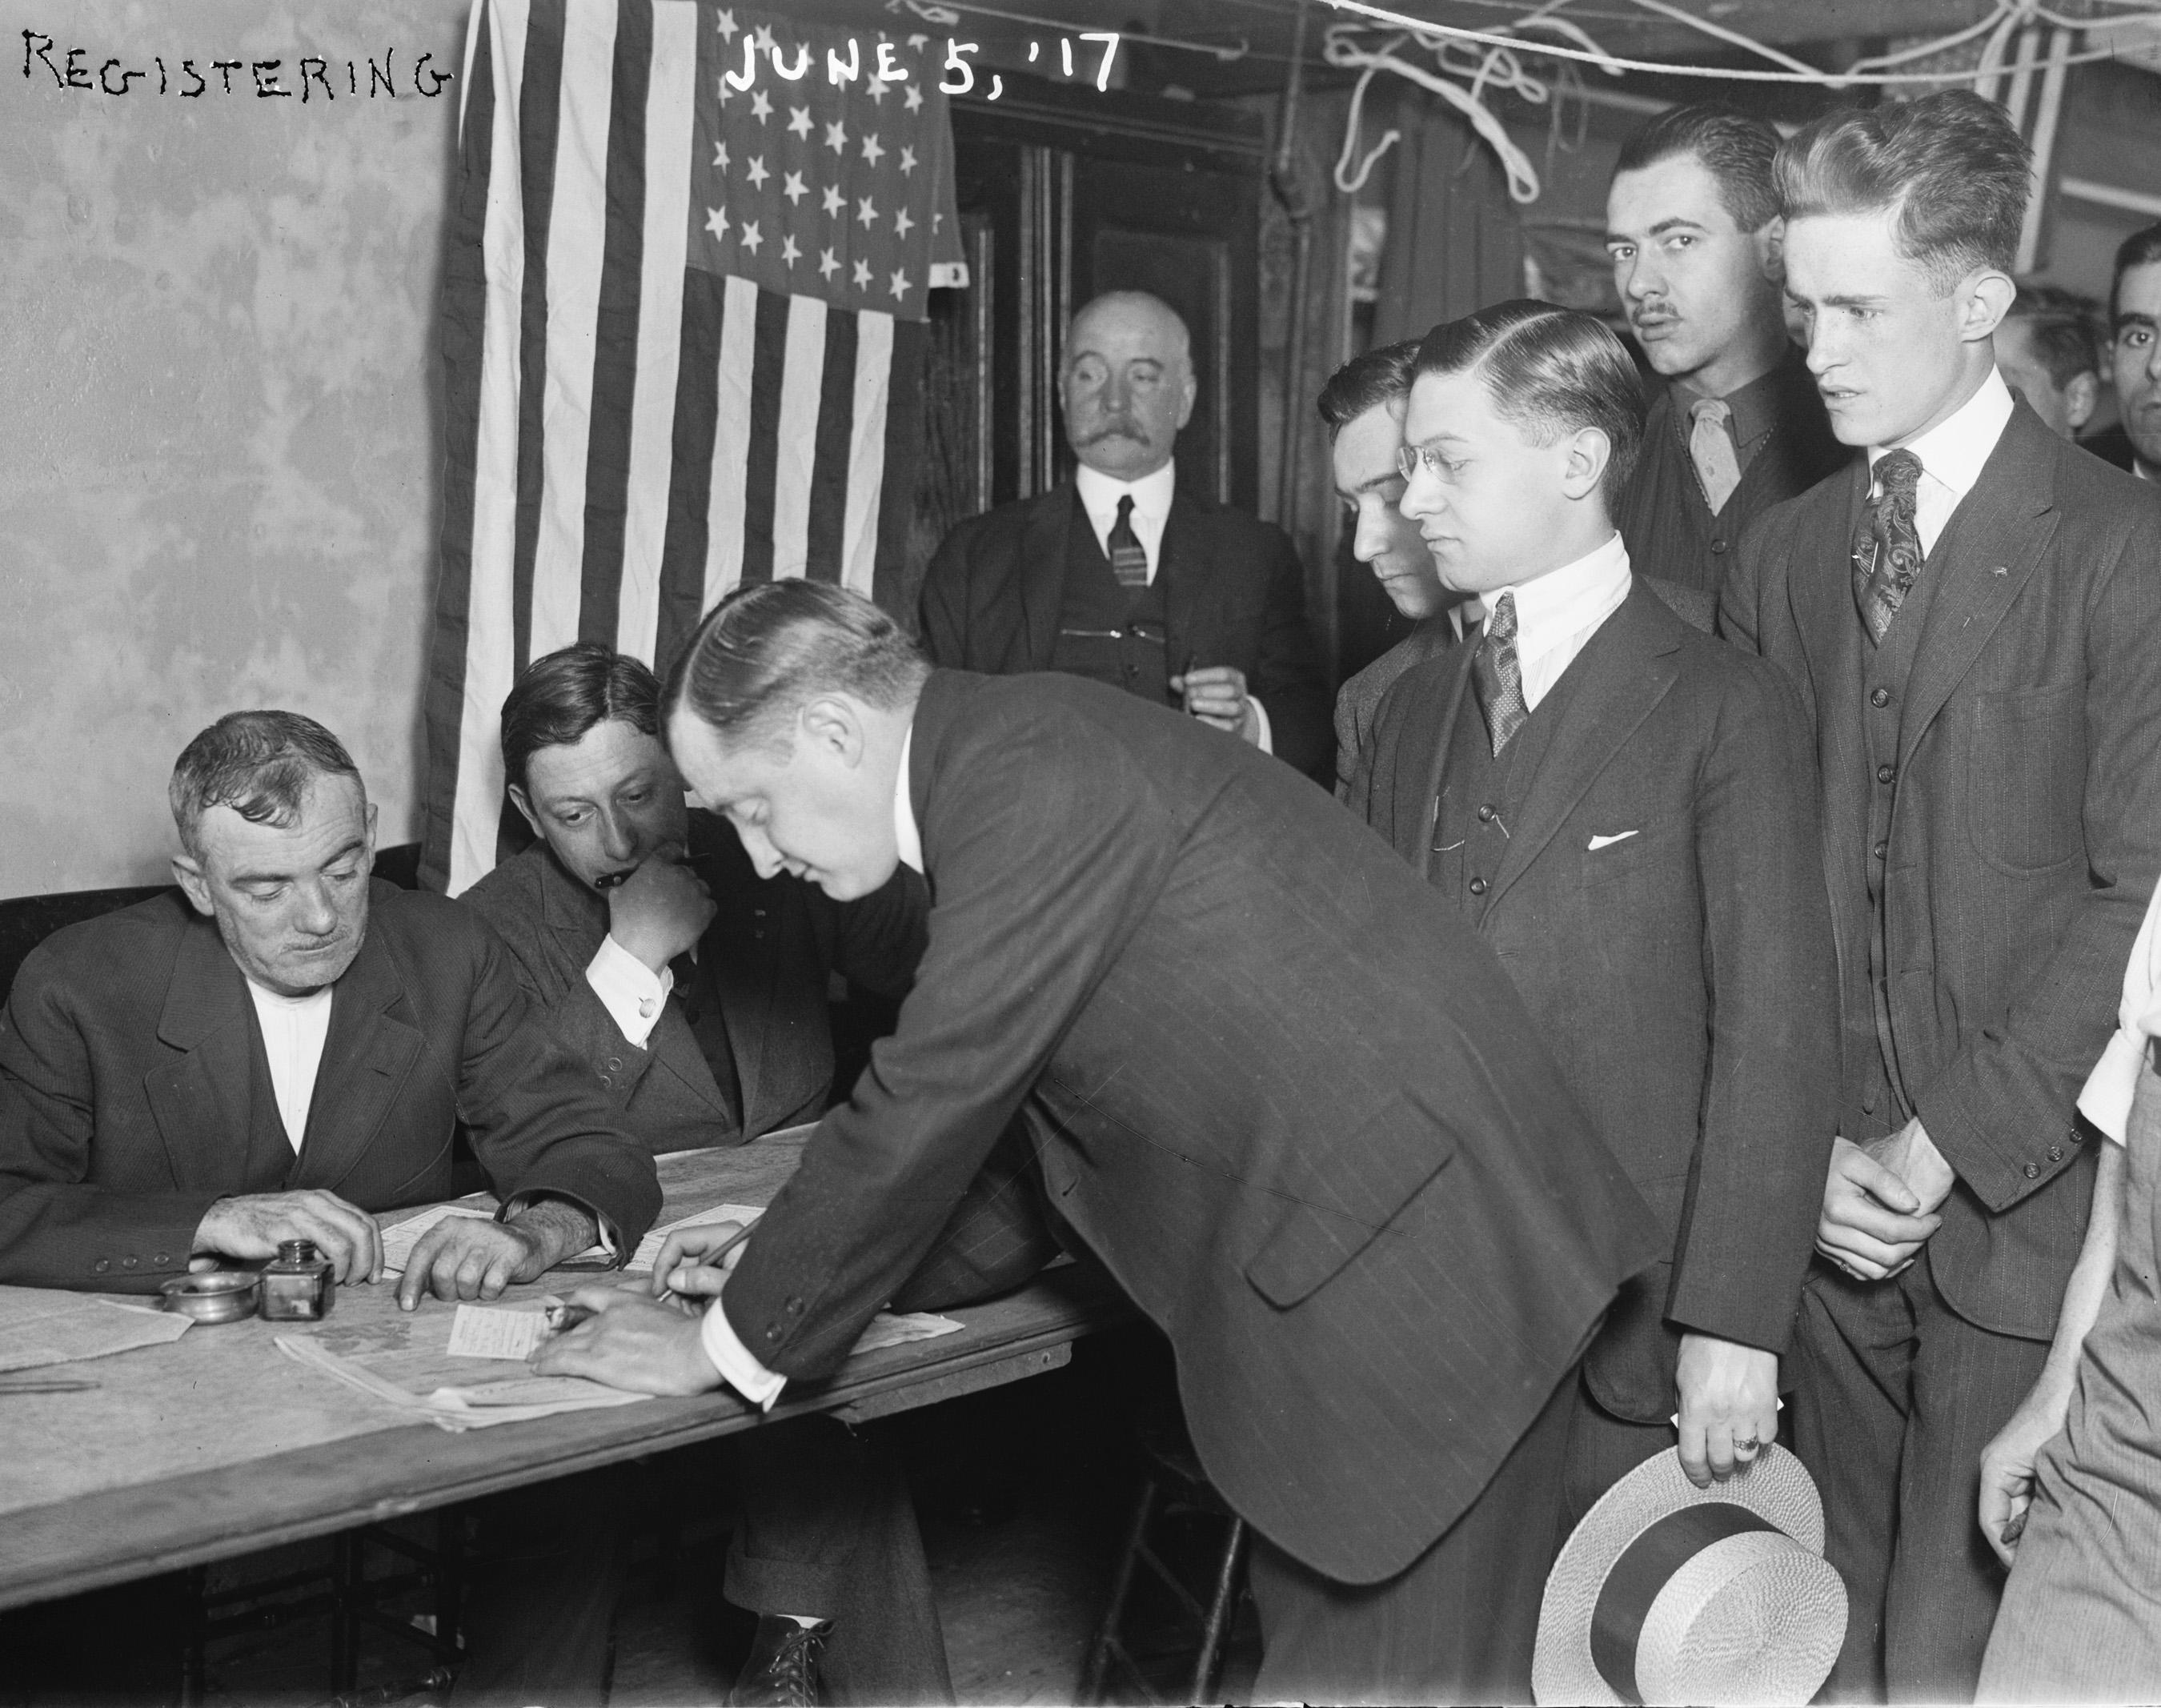 USA registration